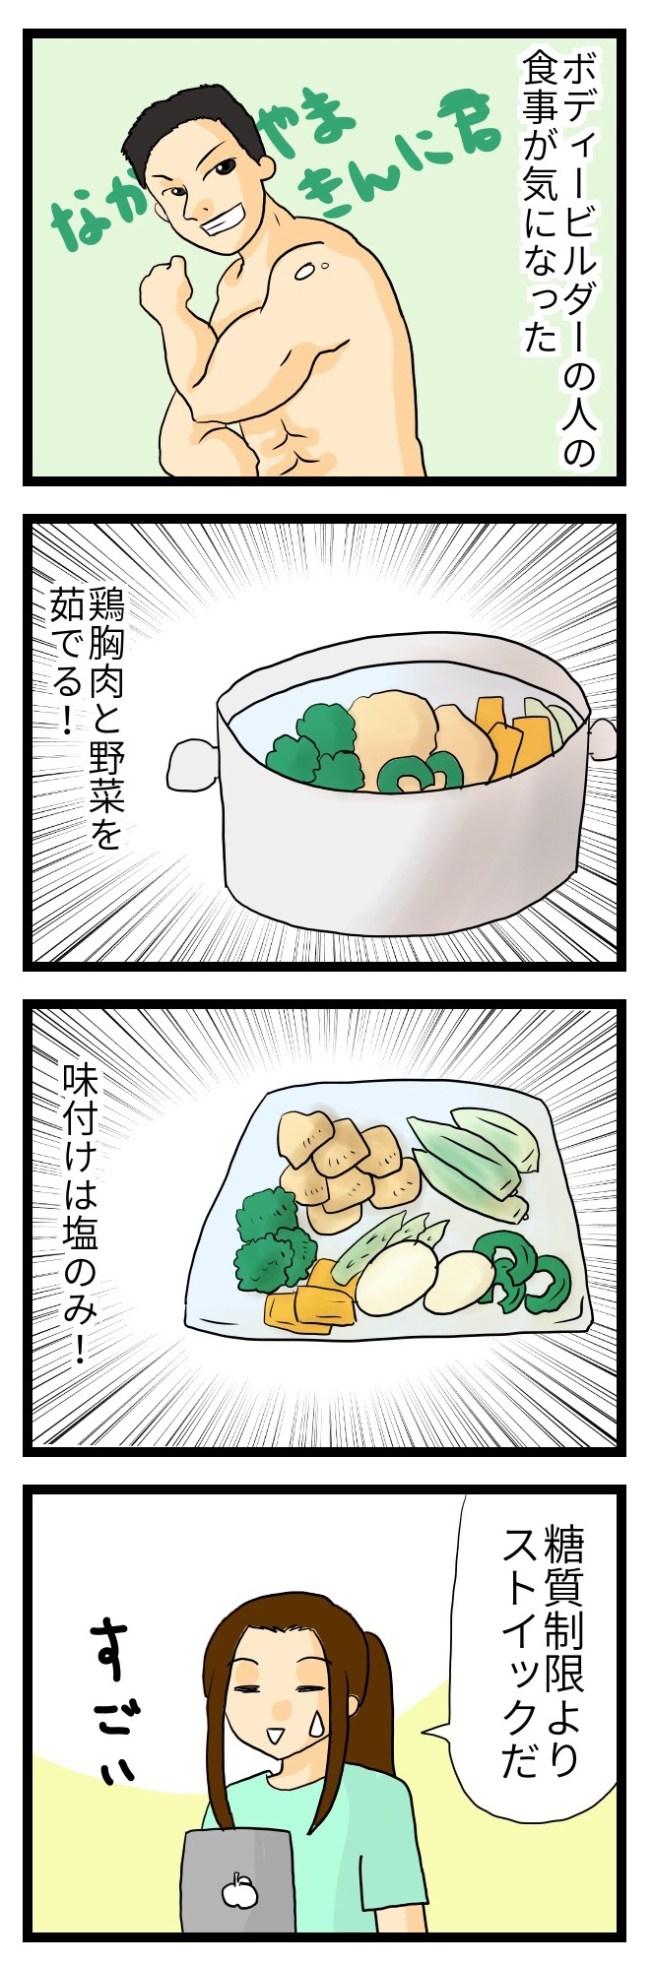 食事 筋 トレ